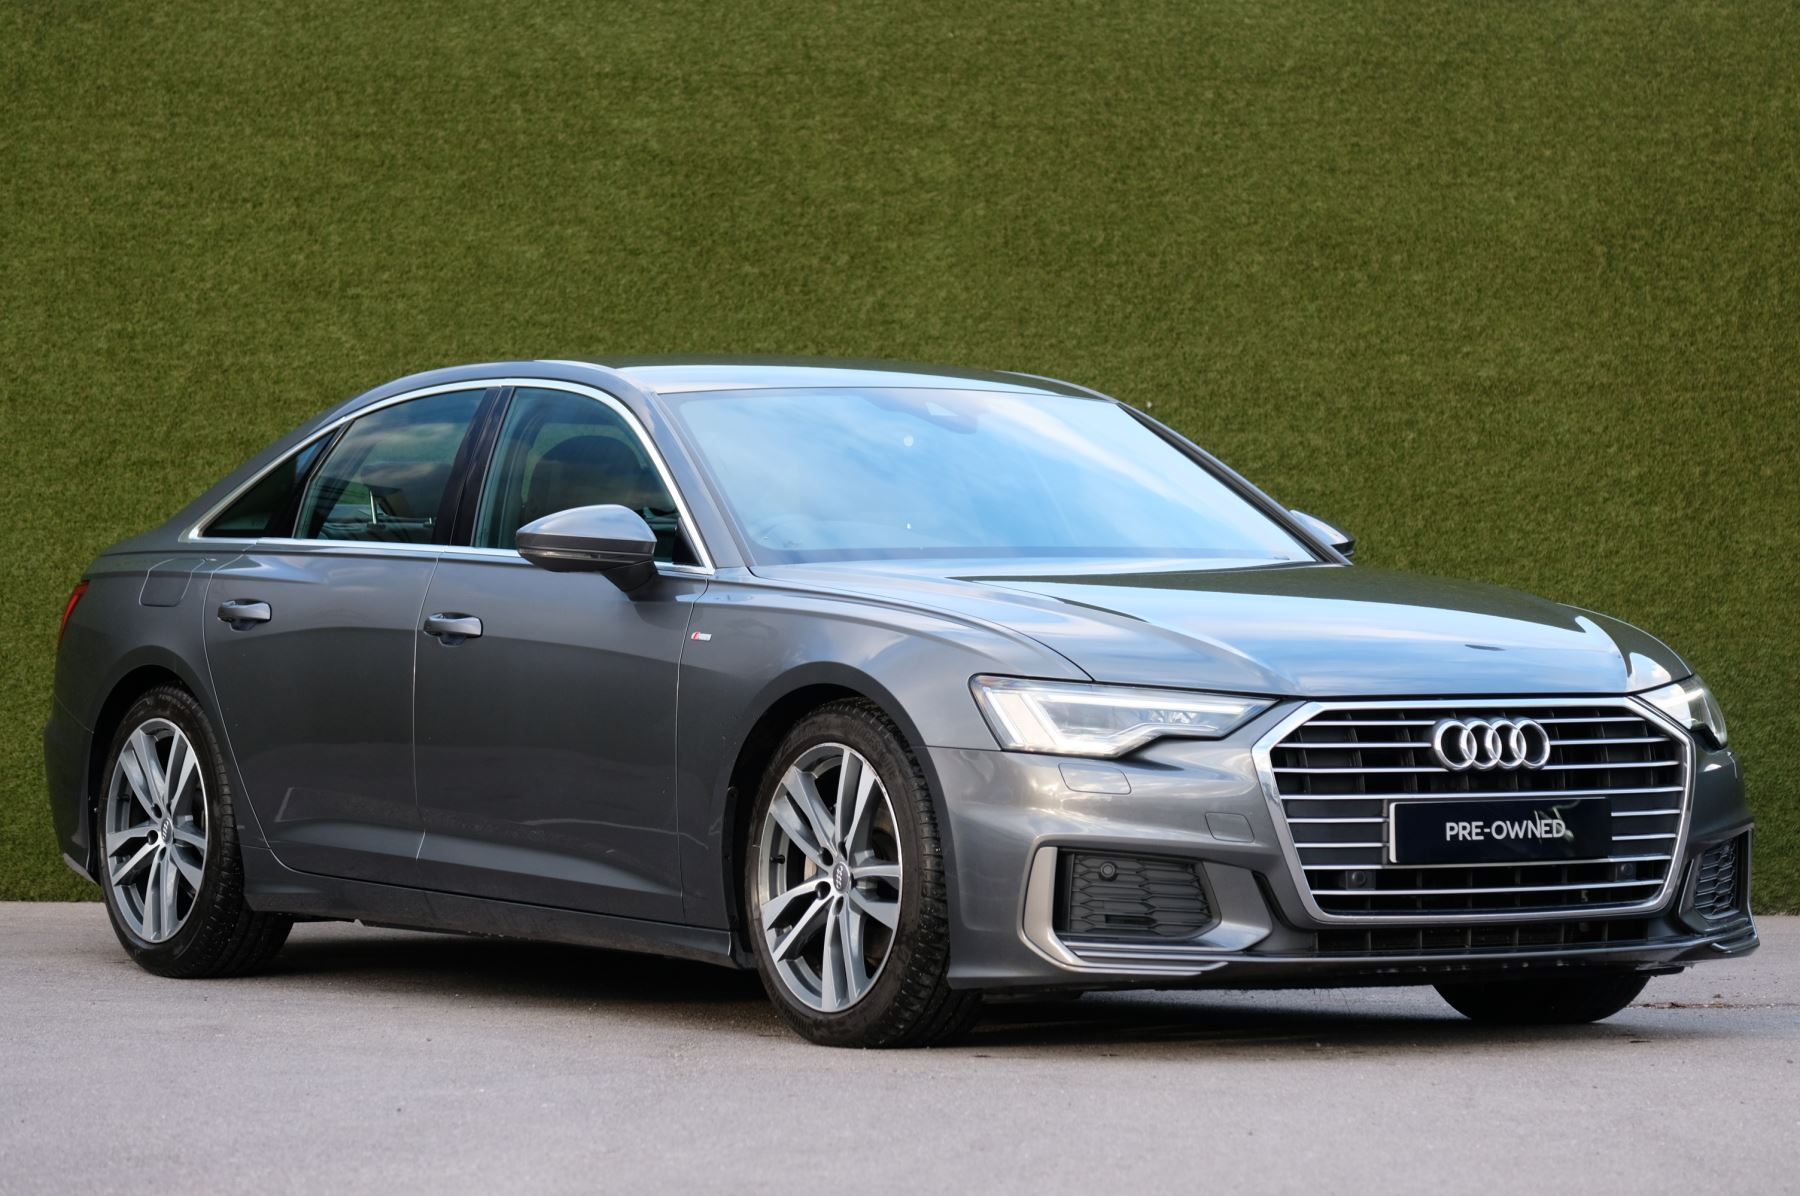 Audi A6 40 TDI S Line S Tronic 2.0 Diesel Automatic 4 door Saloon (2018)